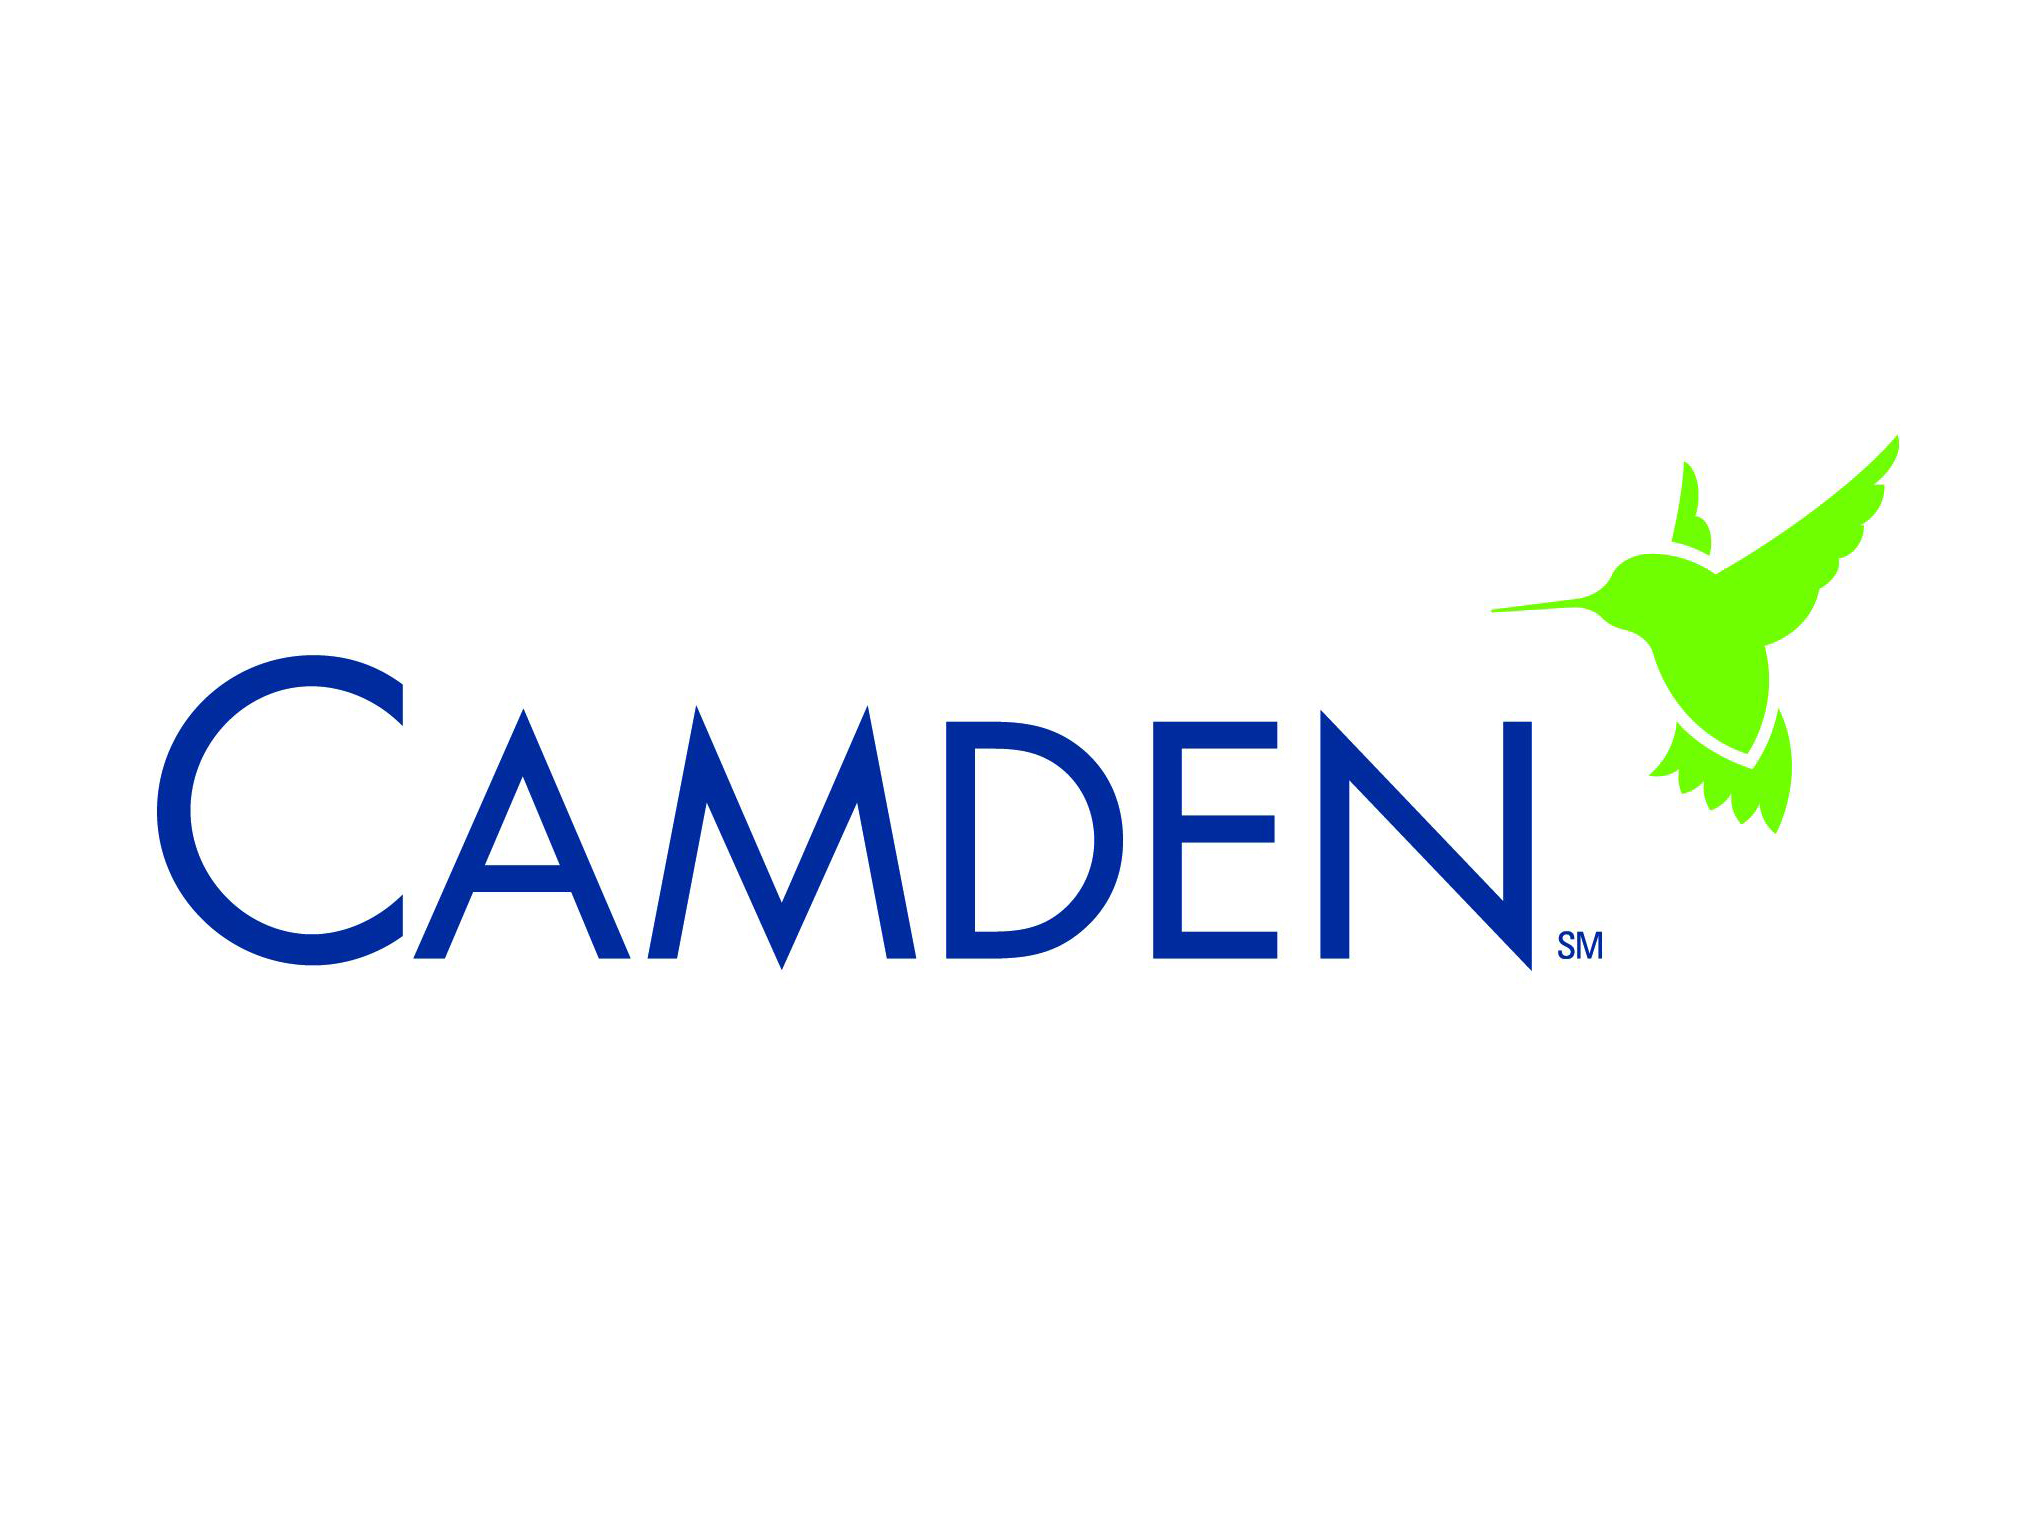 Camden Property Trust 2018.jpg